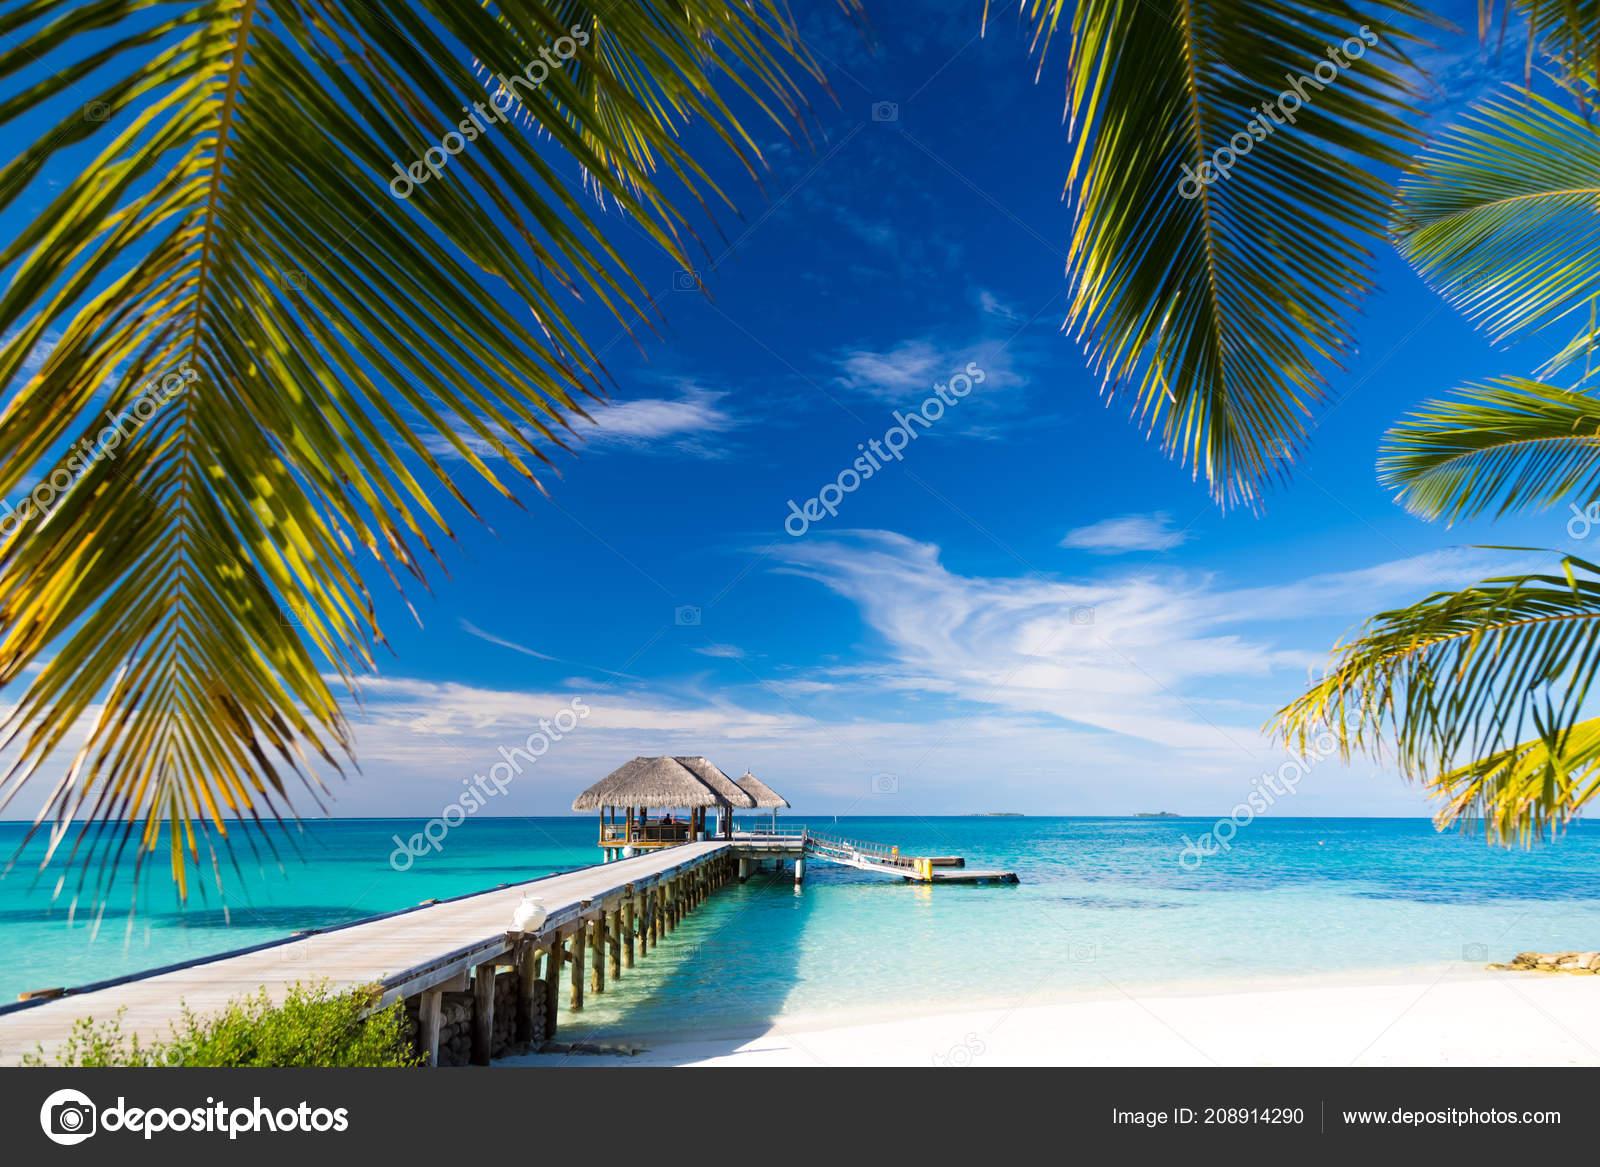 Tranquil Beach Scene Exotic Tropical Beach Landscape